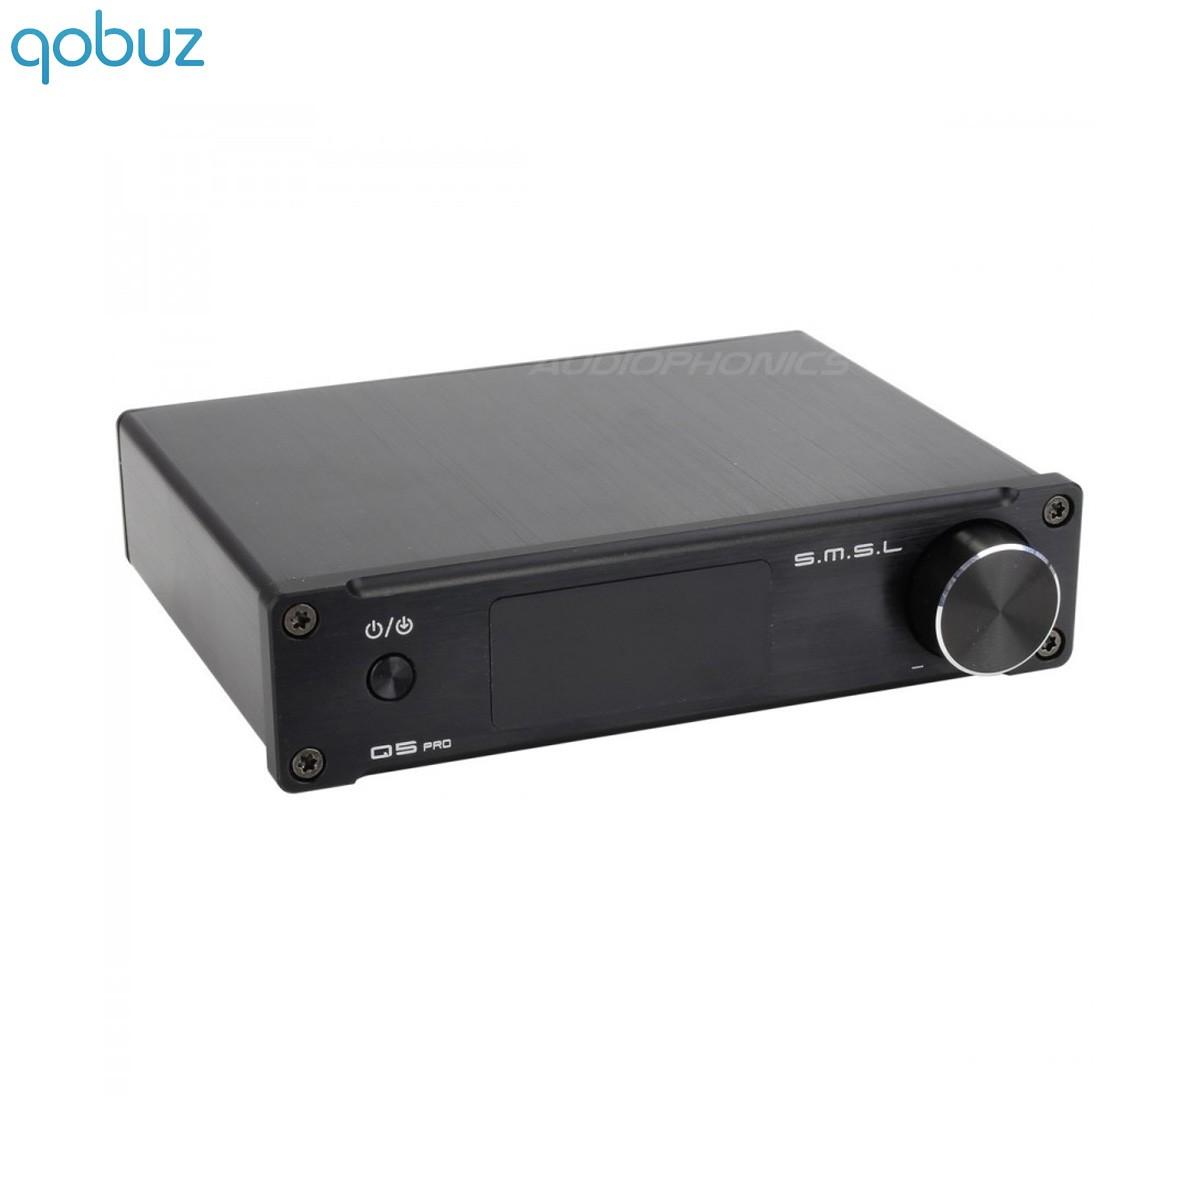 SMSL Q5 PRO FDA Amplifier TAS5508 2x25W + Subwoofer output / 8 Ohm CS5341 SA9023 Black